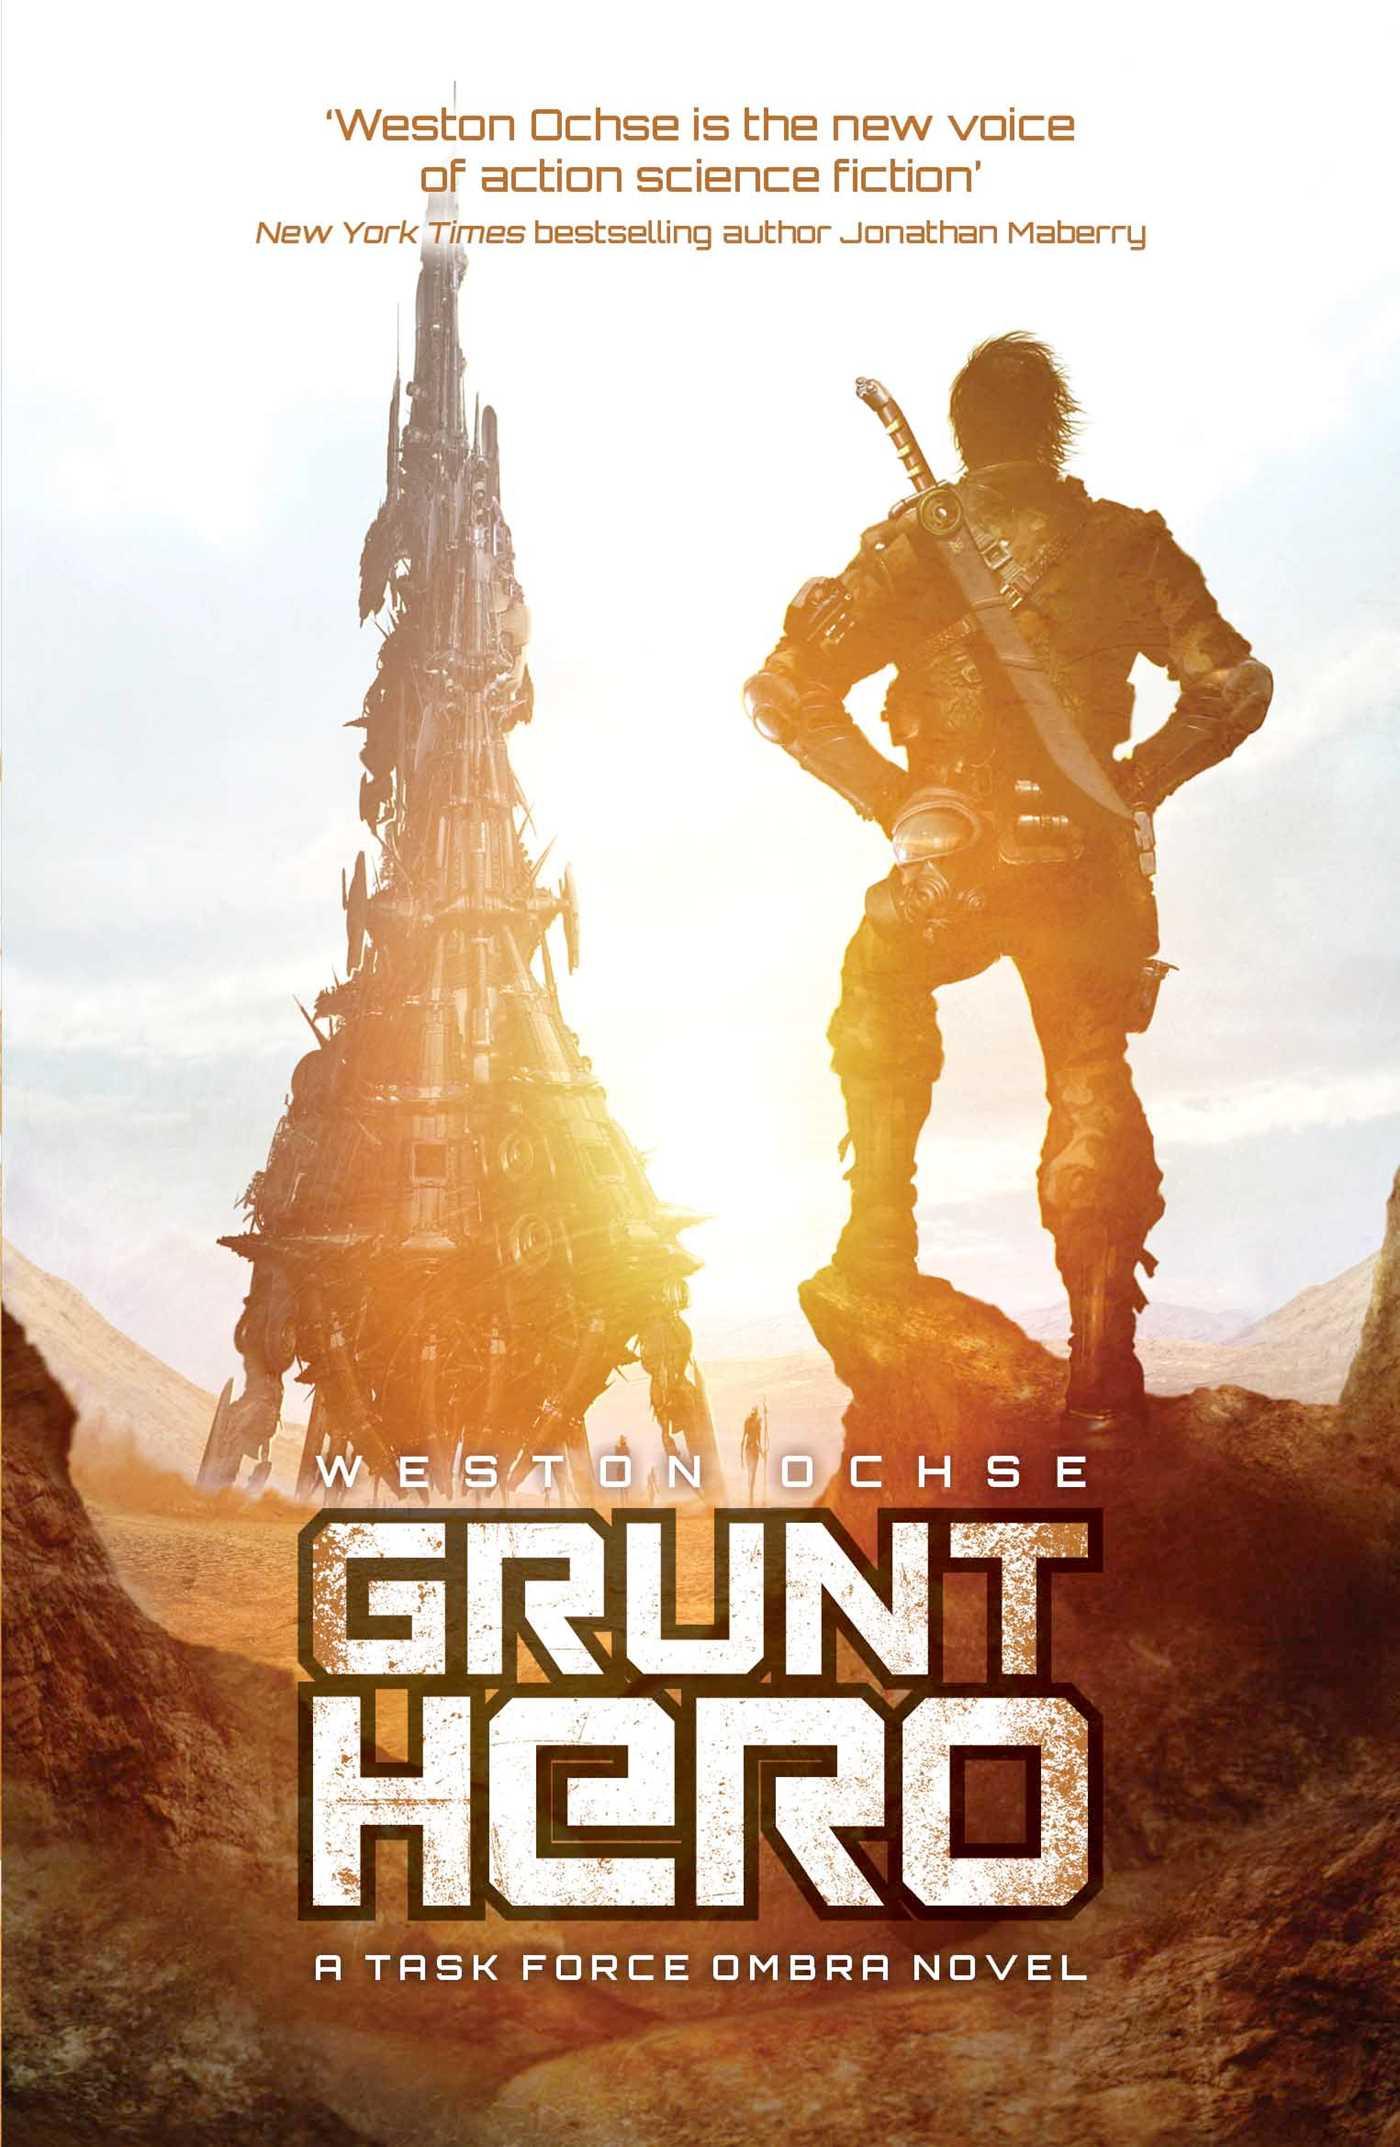 Grunt hero 9781781085158 hr